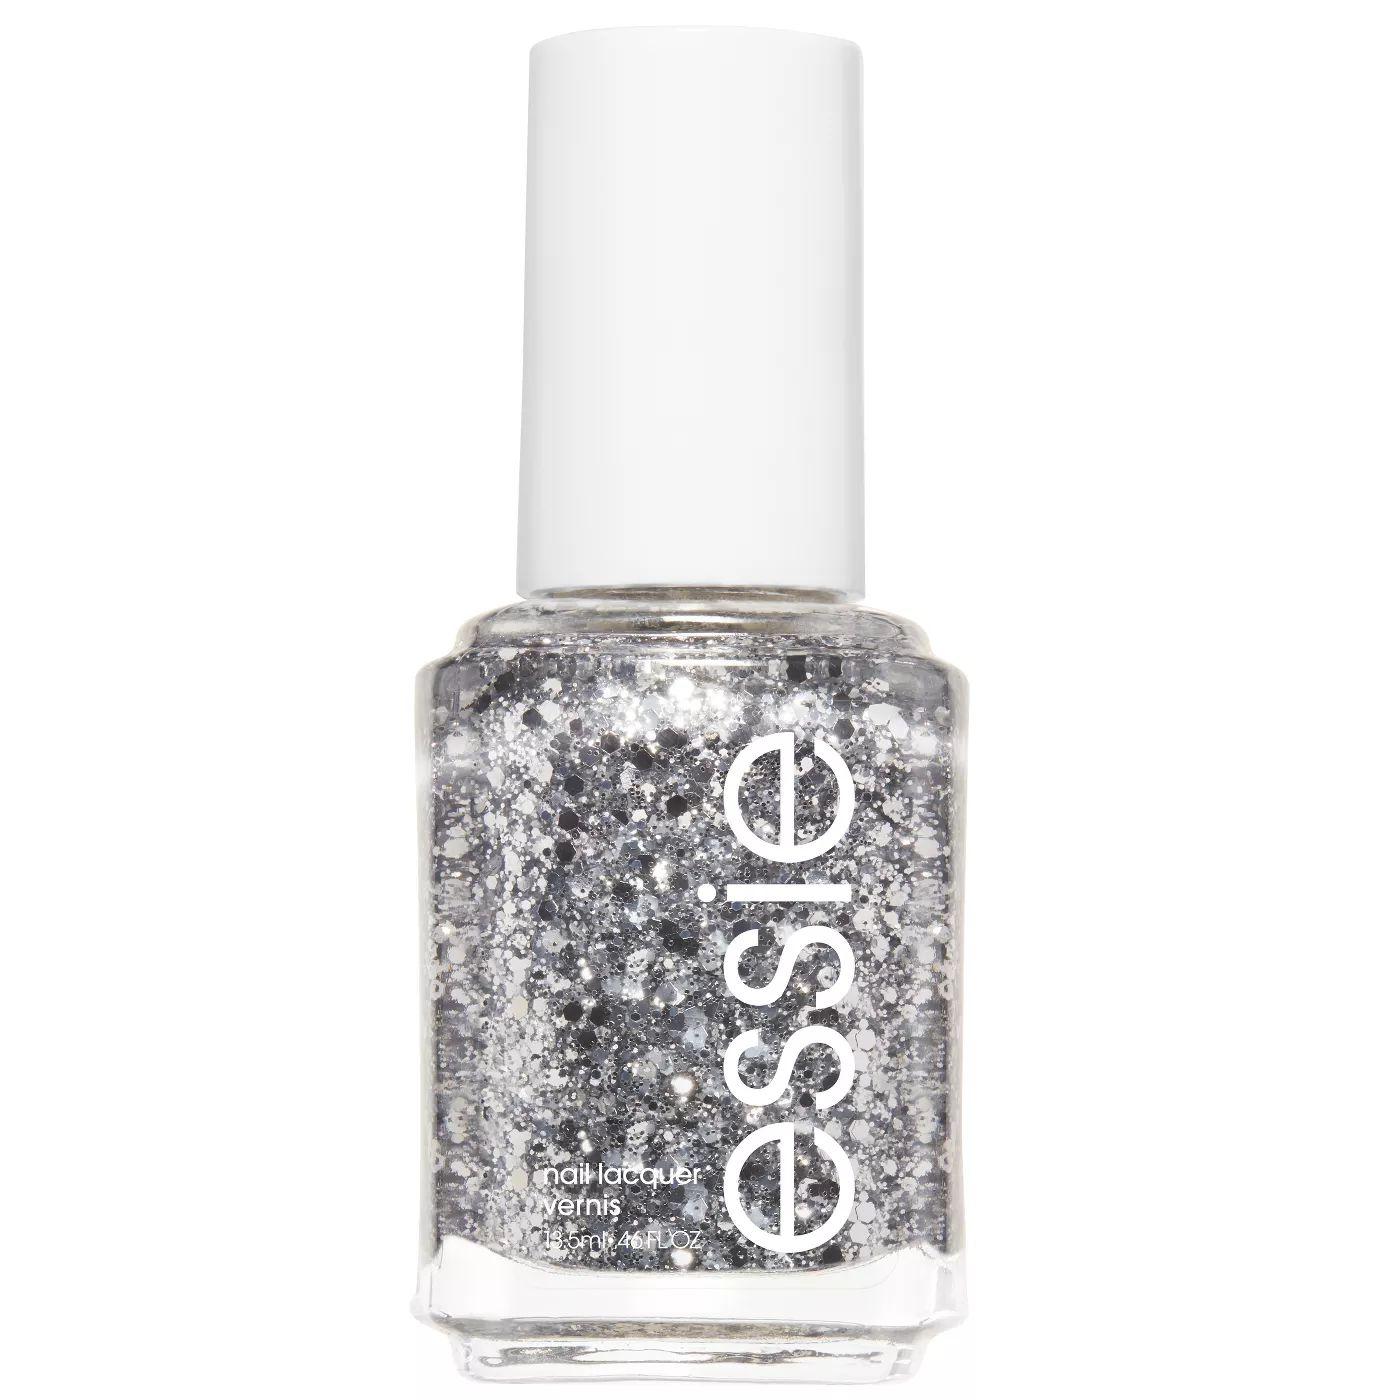 Essie Set in Stones polish, a glittery silver shade